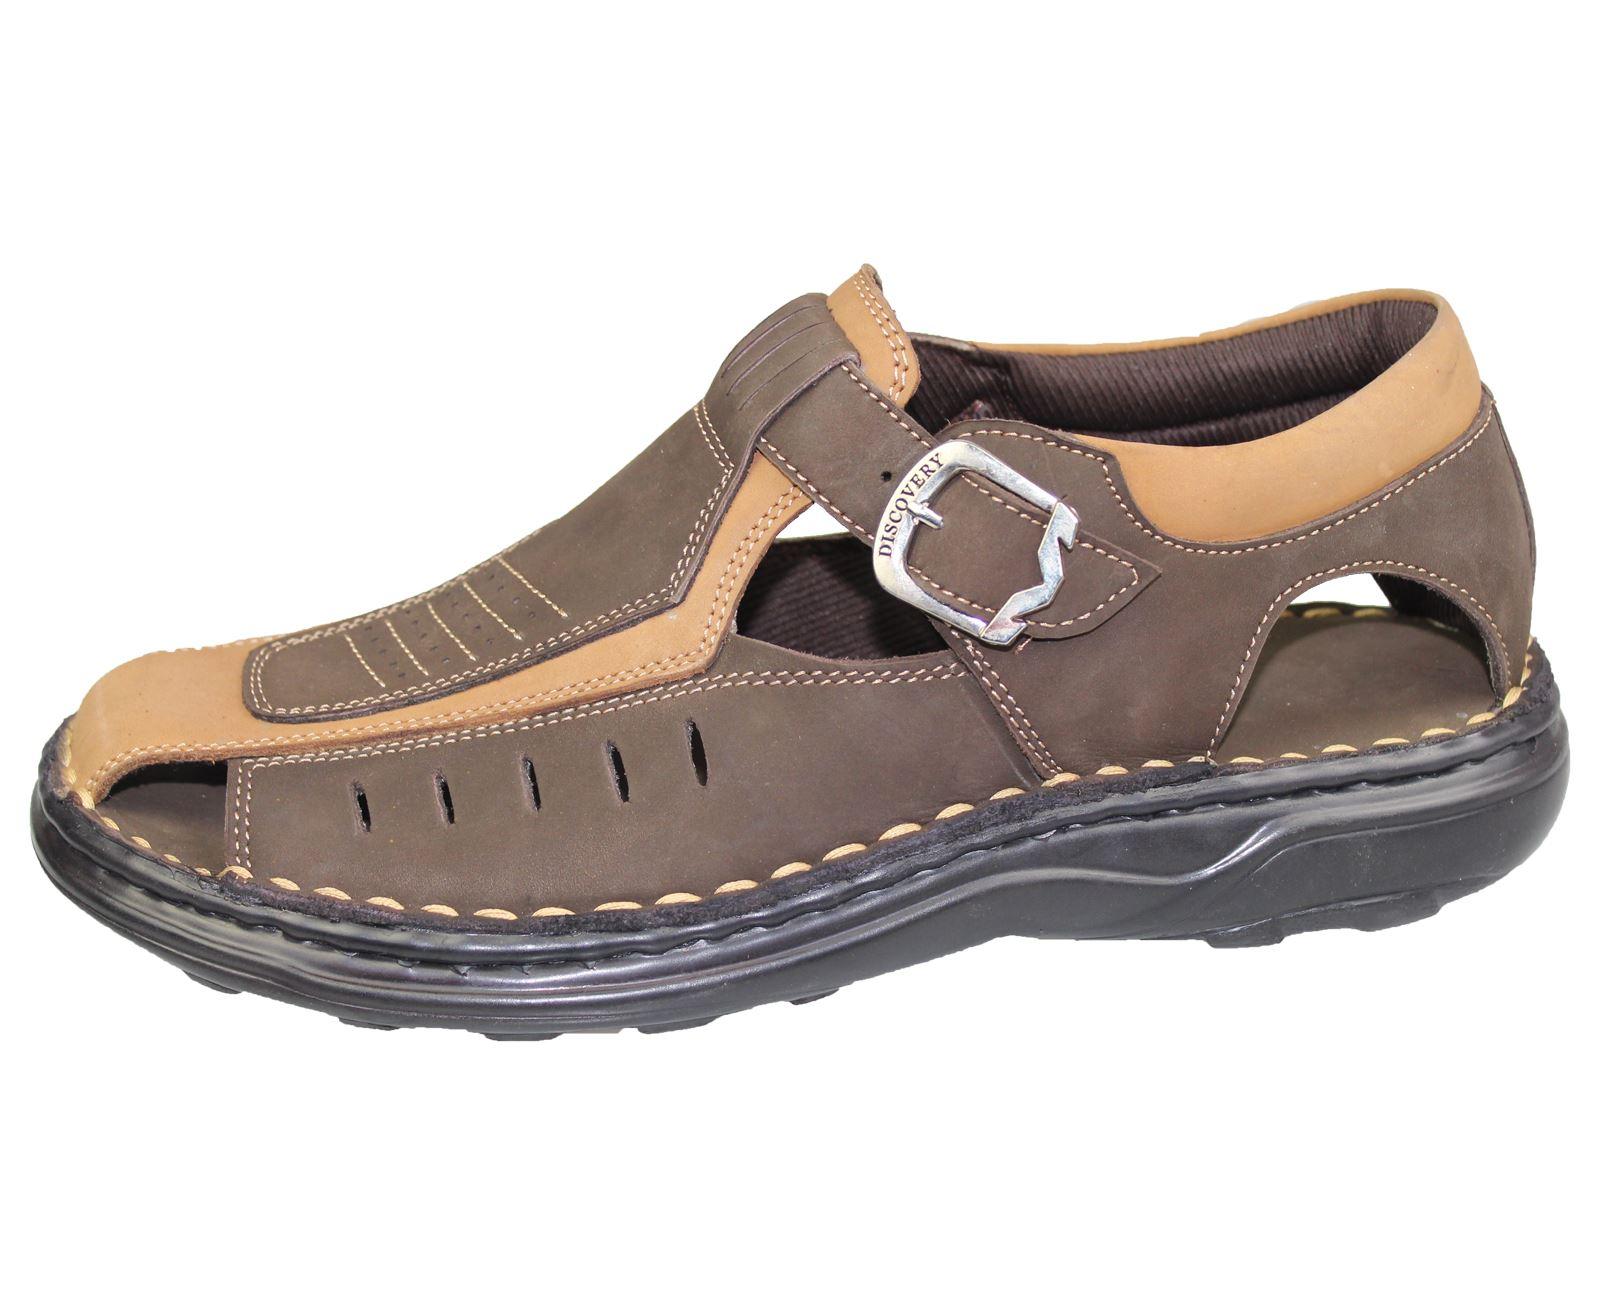 Mens-Buckle-Fastening-Sandals-Flat-Beach-Walking-Fashion-Casual-Summer-Slipper miniatura 13